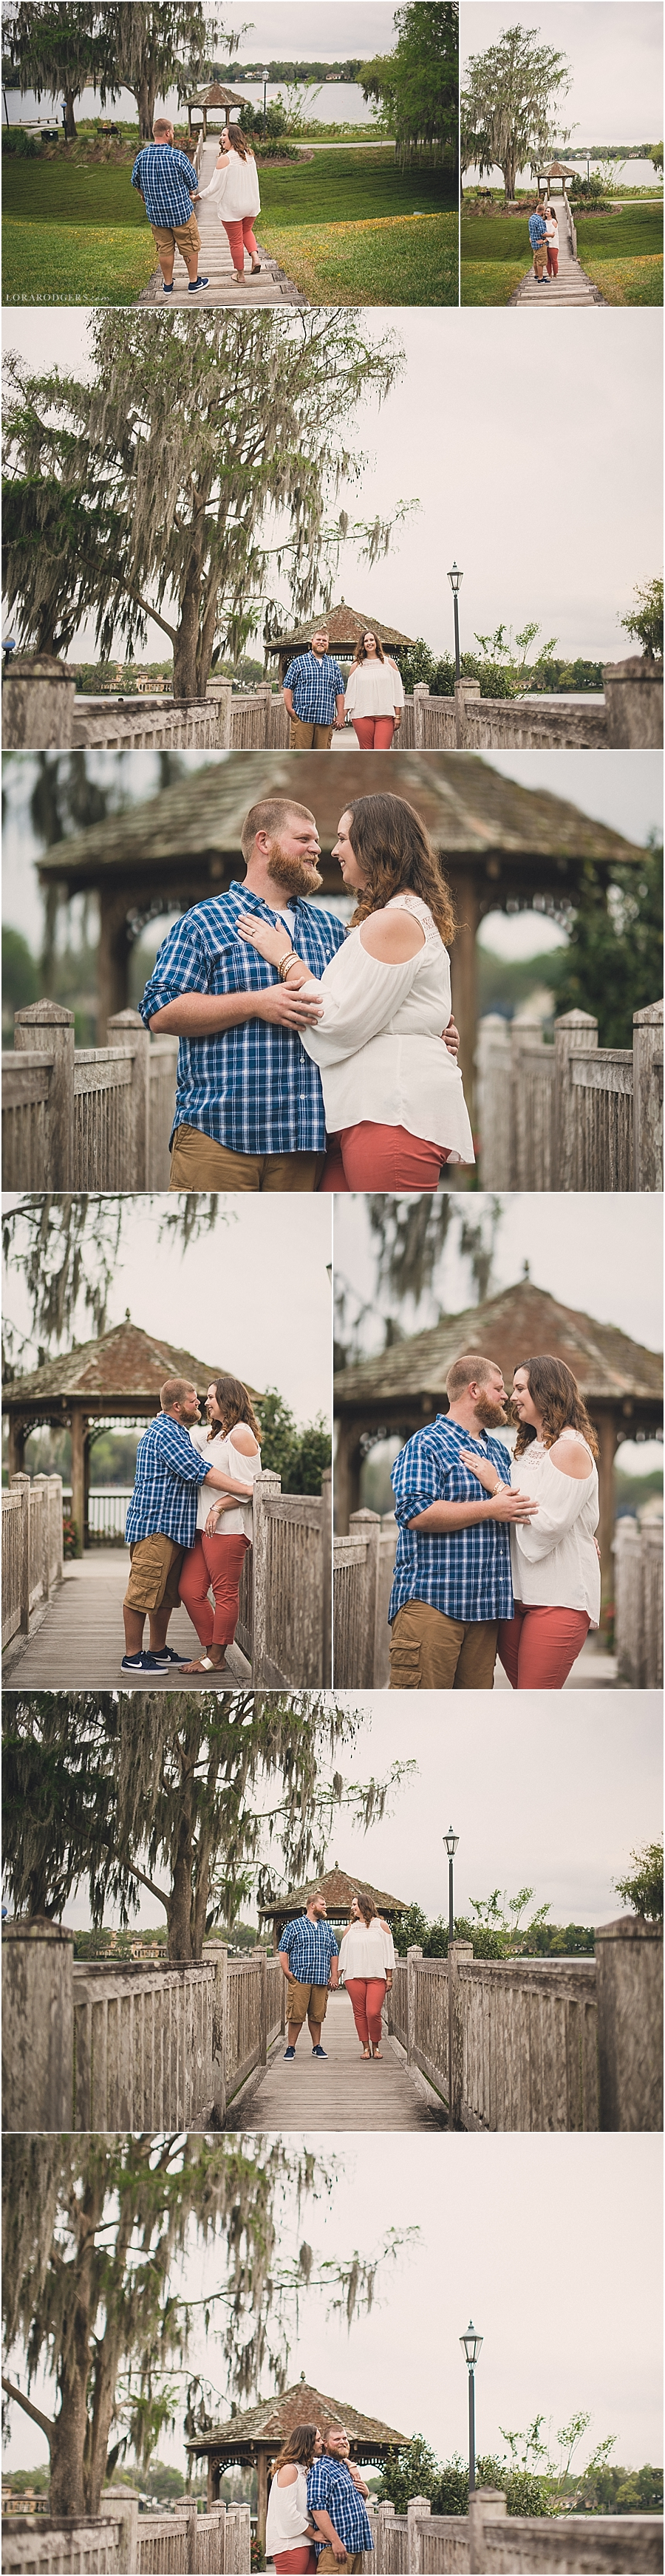 Rollins_College_Winter_Park_Florida_Engagement_003